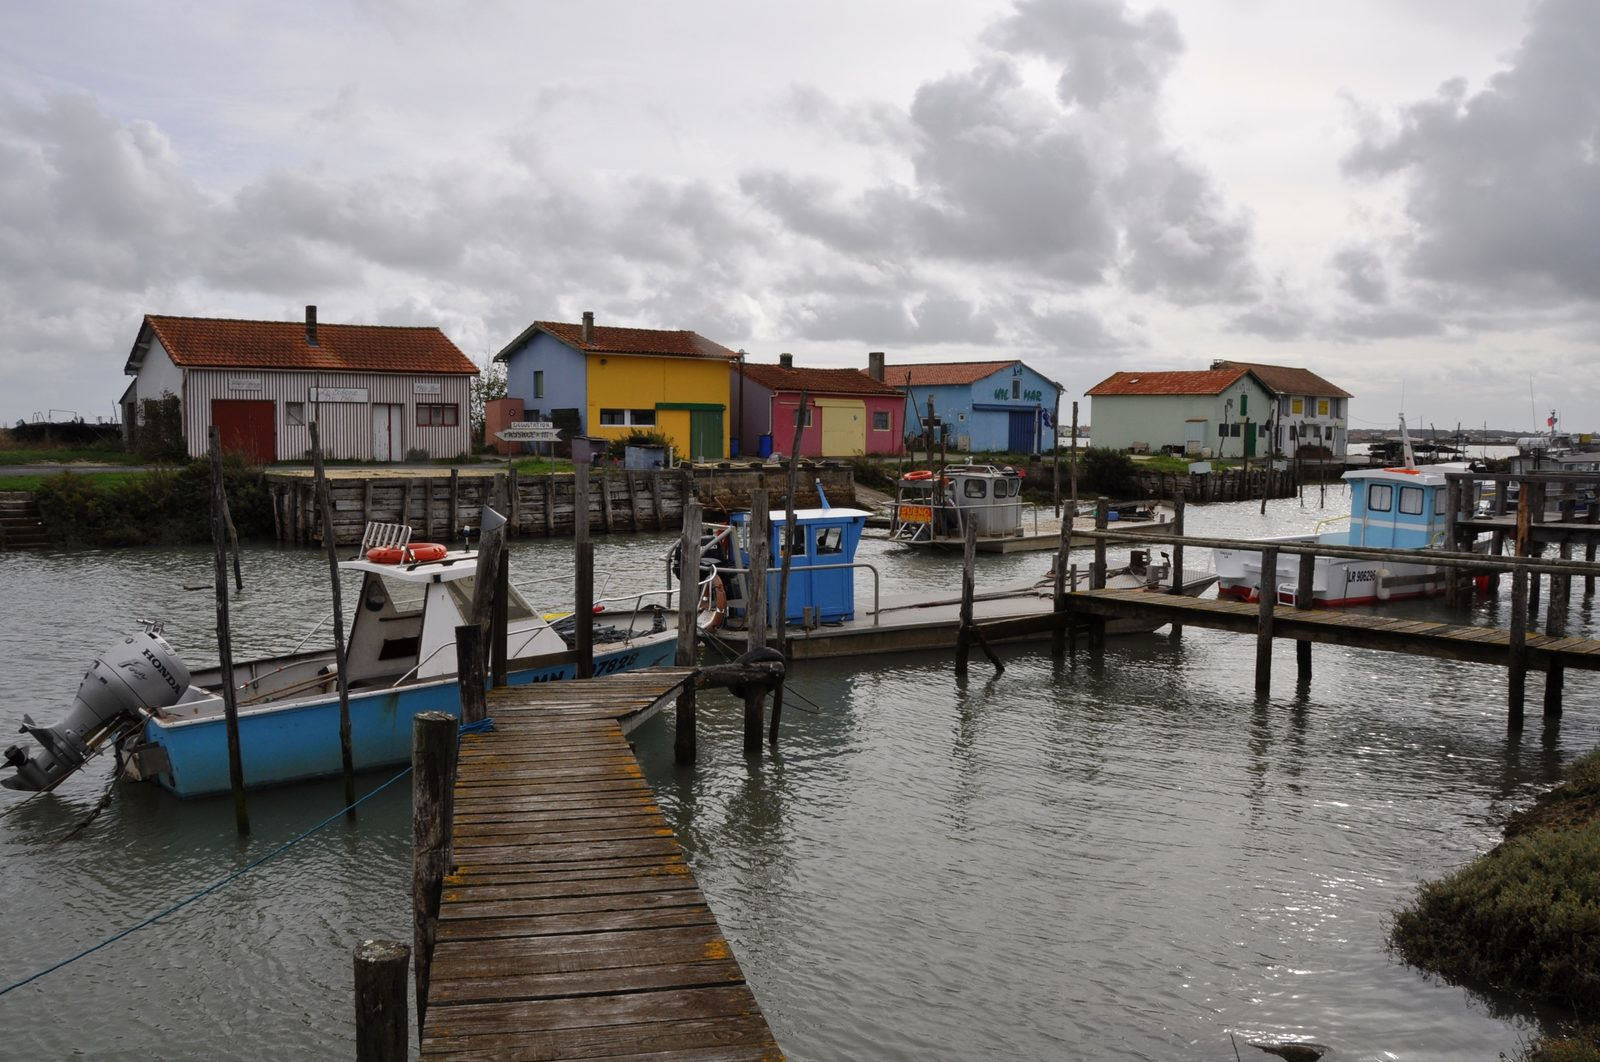 Vakantie, Frankrijk, Charente Maritime, Ile d'Oleron, strand, vakantiehuizen